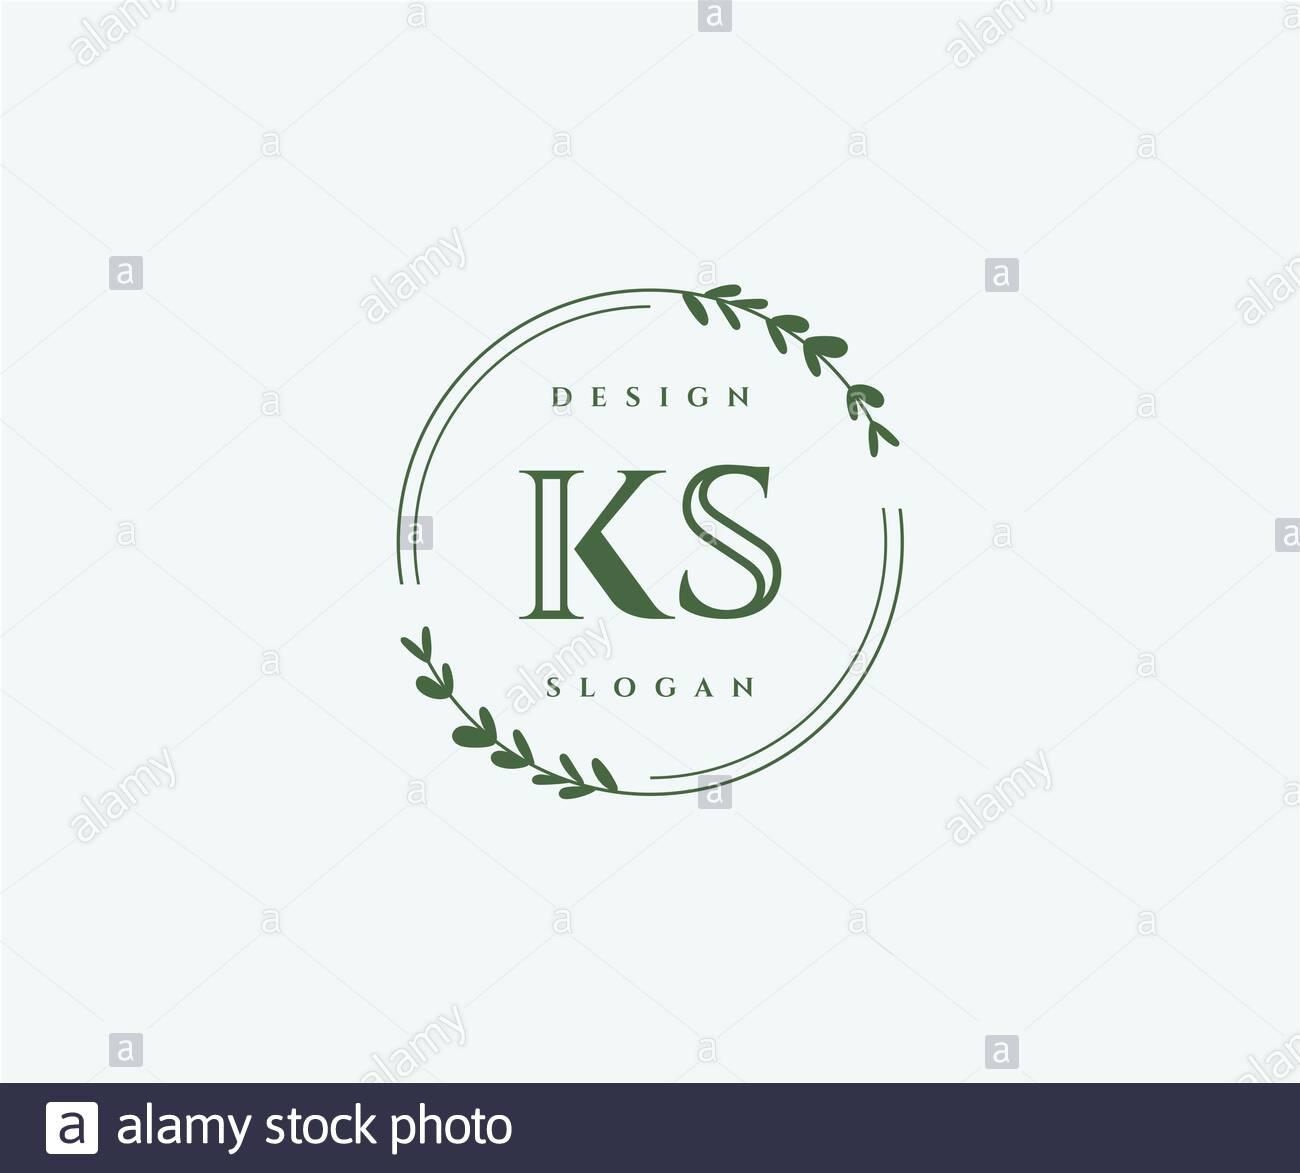 Initial Ks Beauty Monogram And Elegant Logo Design Stock Vector Image Art Alamy